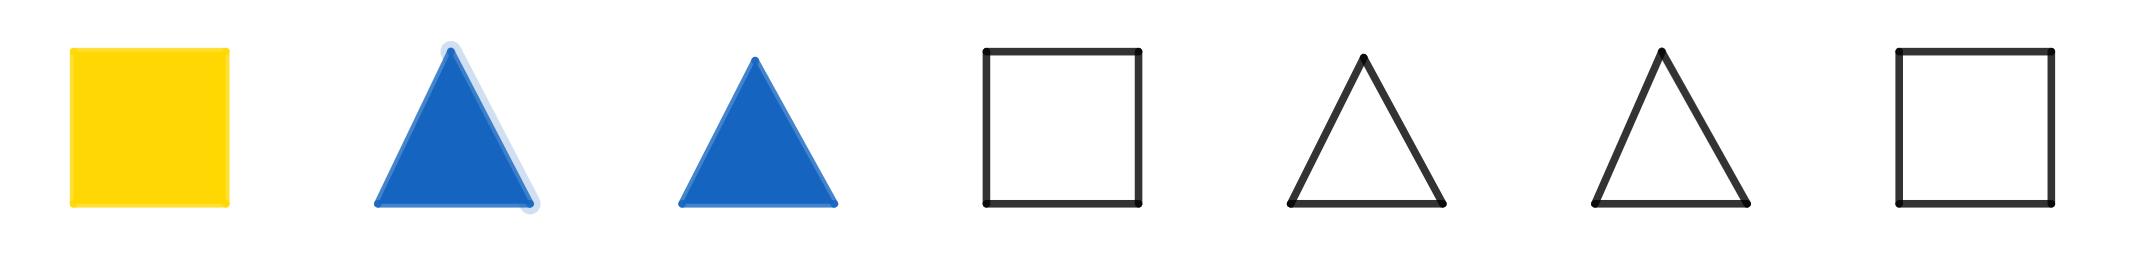 Sequência de formas geométricas e cores